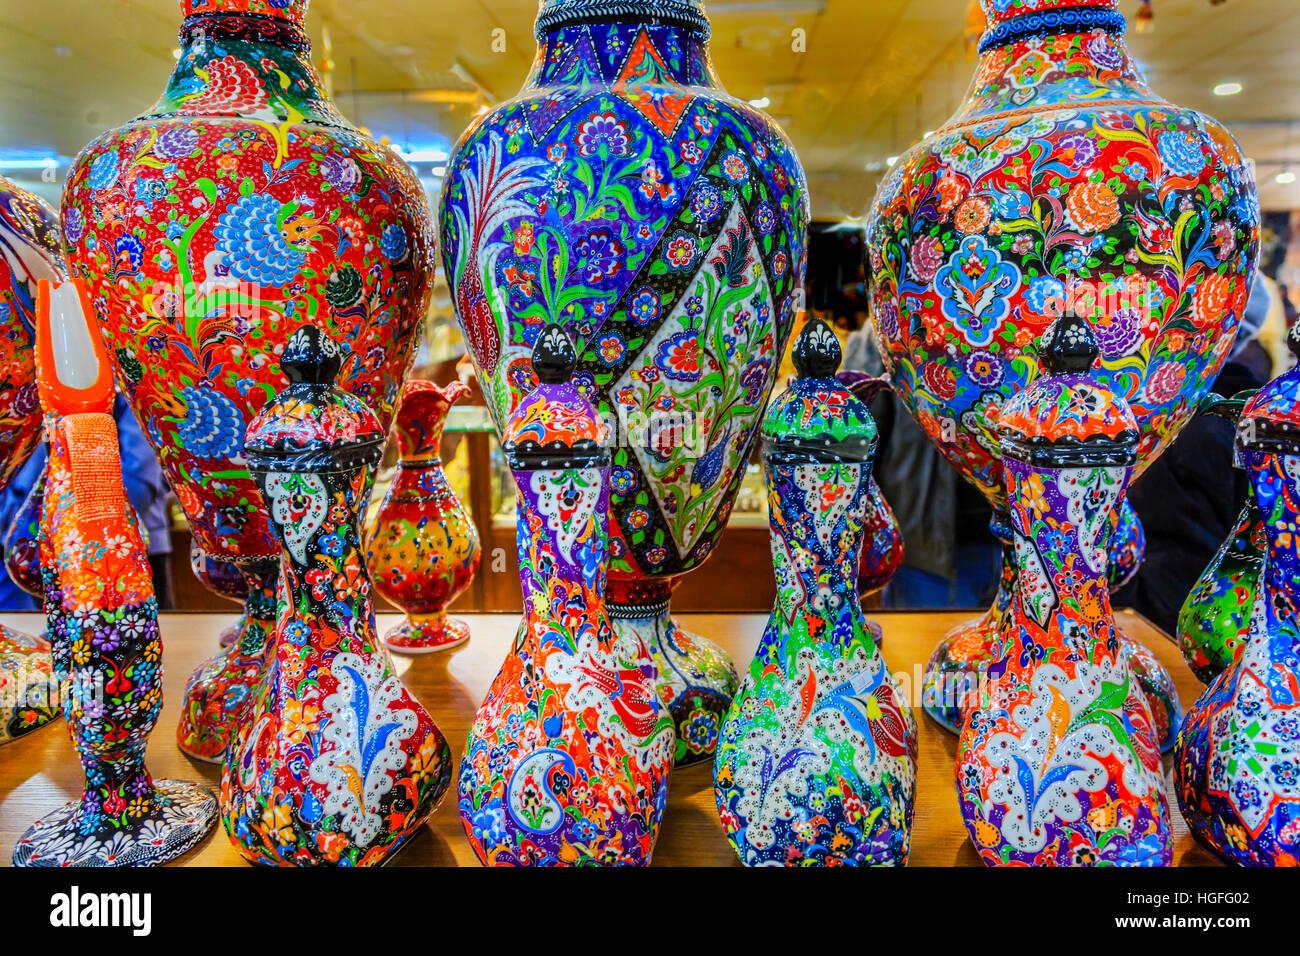 Ancient Arab Islamic Red Blue Orange Flower Designs Pottery Vases Madaba Jordan - Stock Image